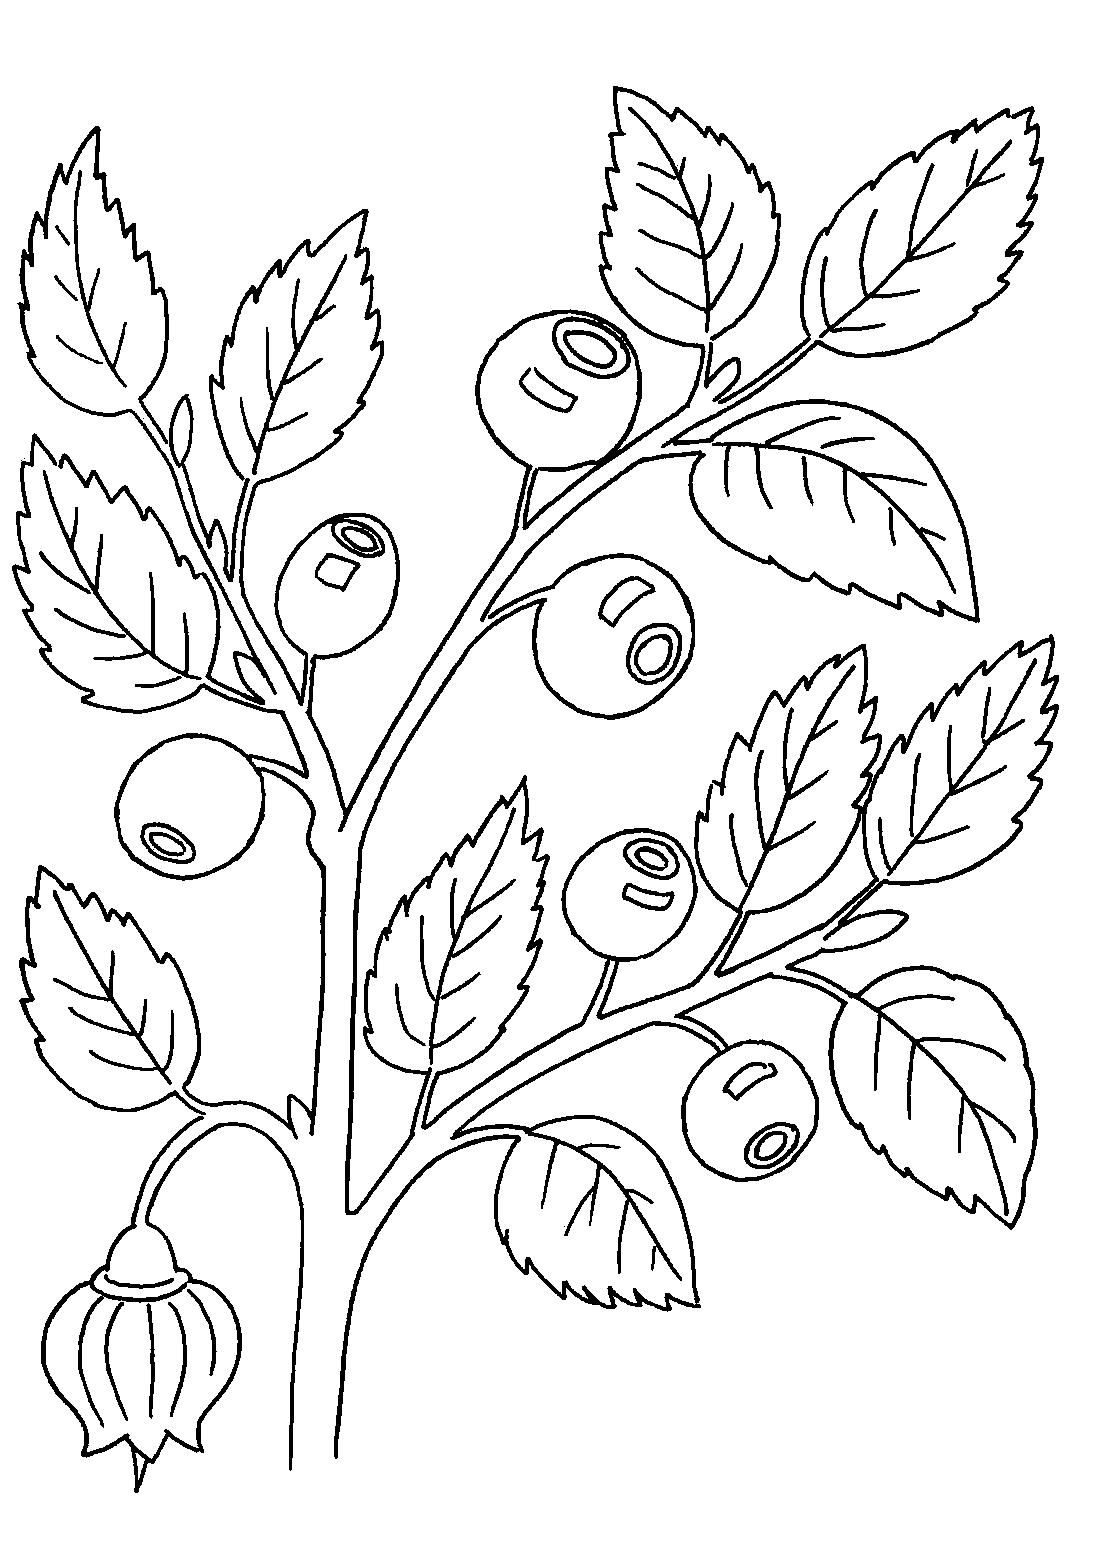 Черника на ветке - раскраска №11152   Printonic.ru